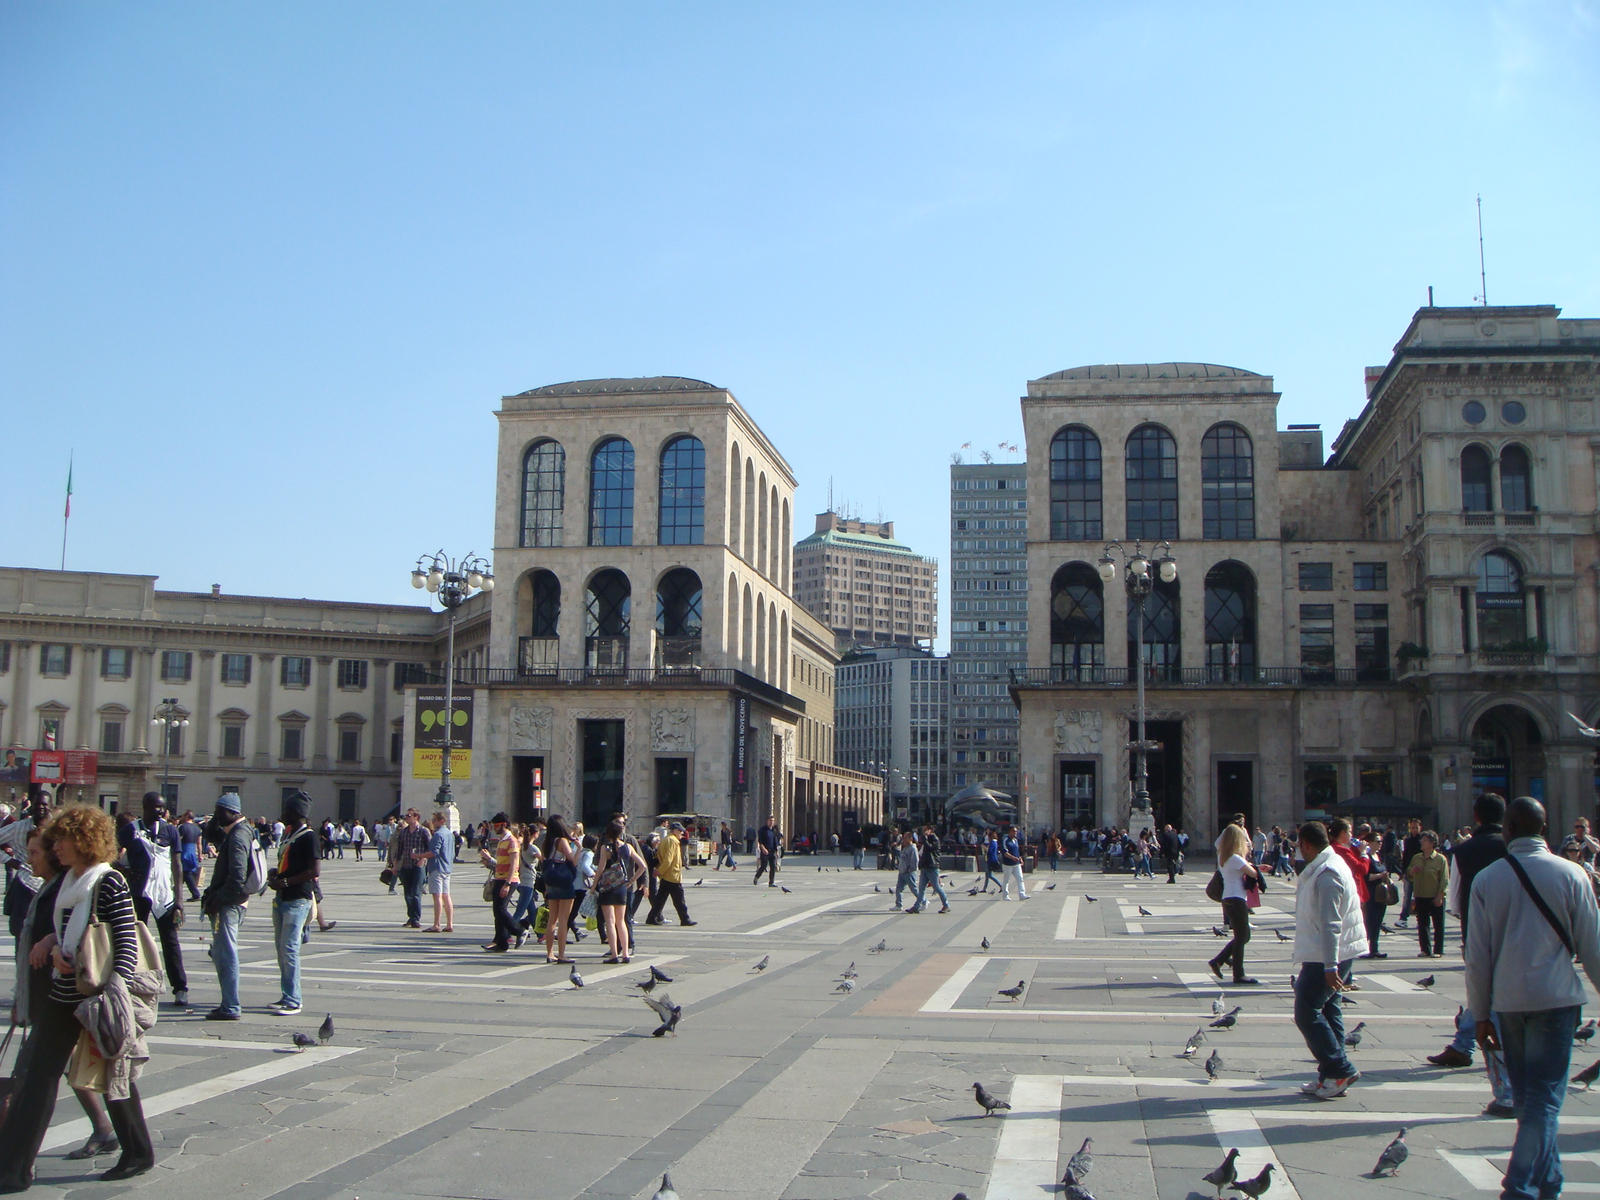 Milano - Piazza del Duomo by mdc01957 on DeviantArt